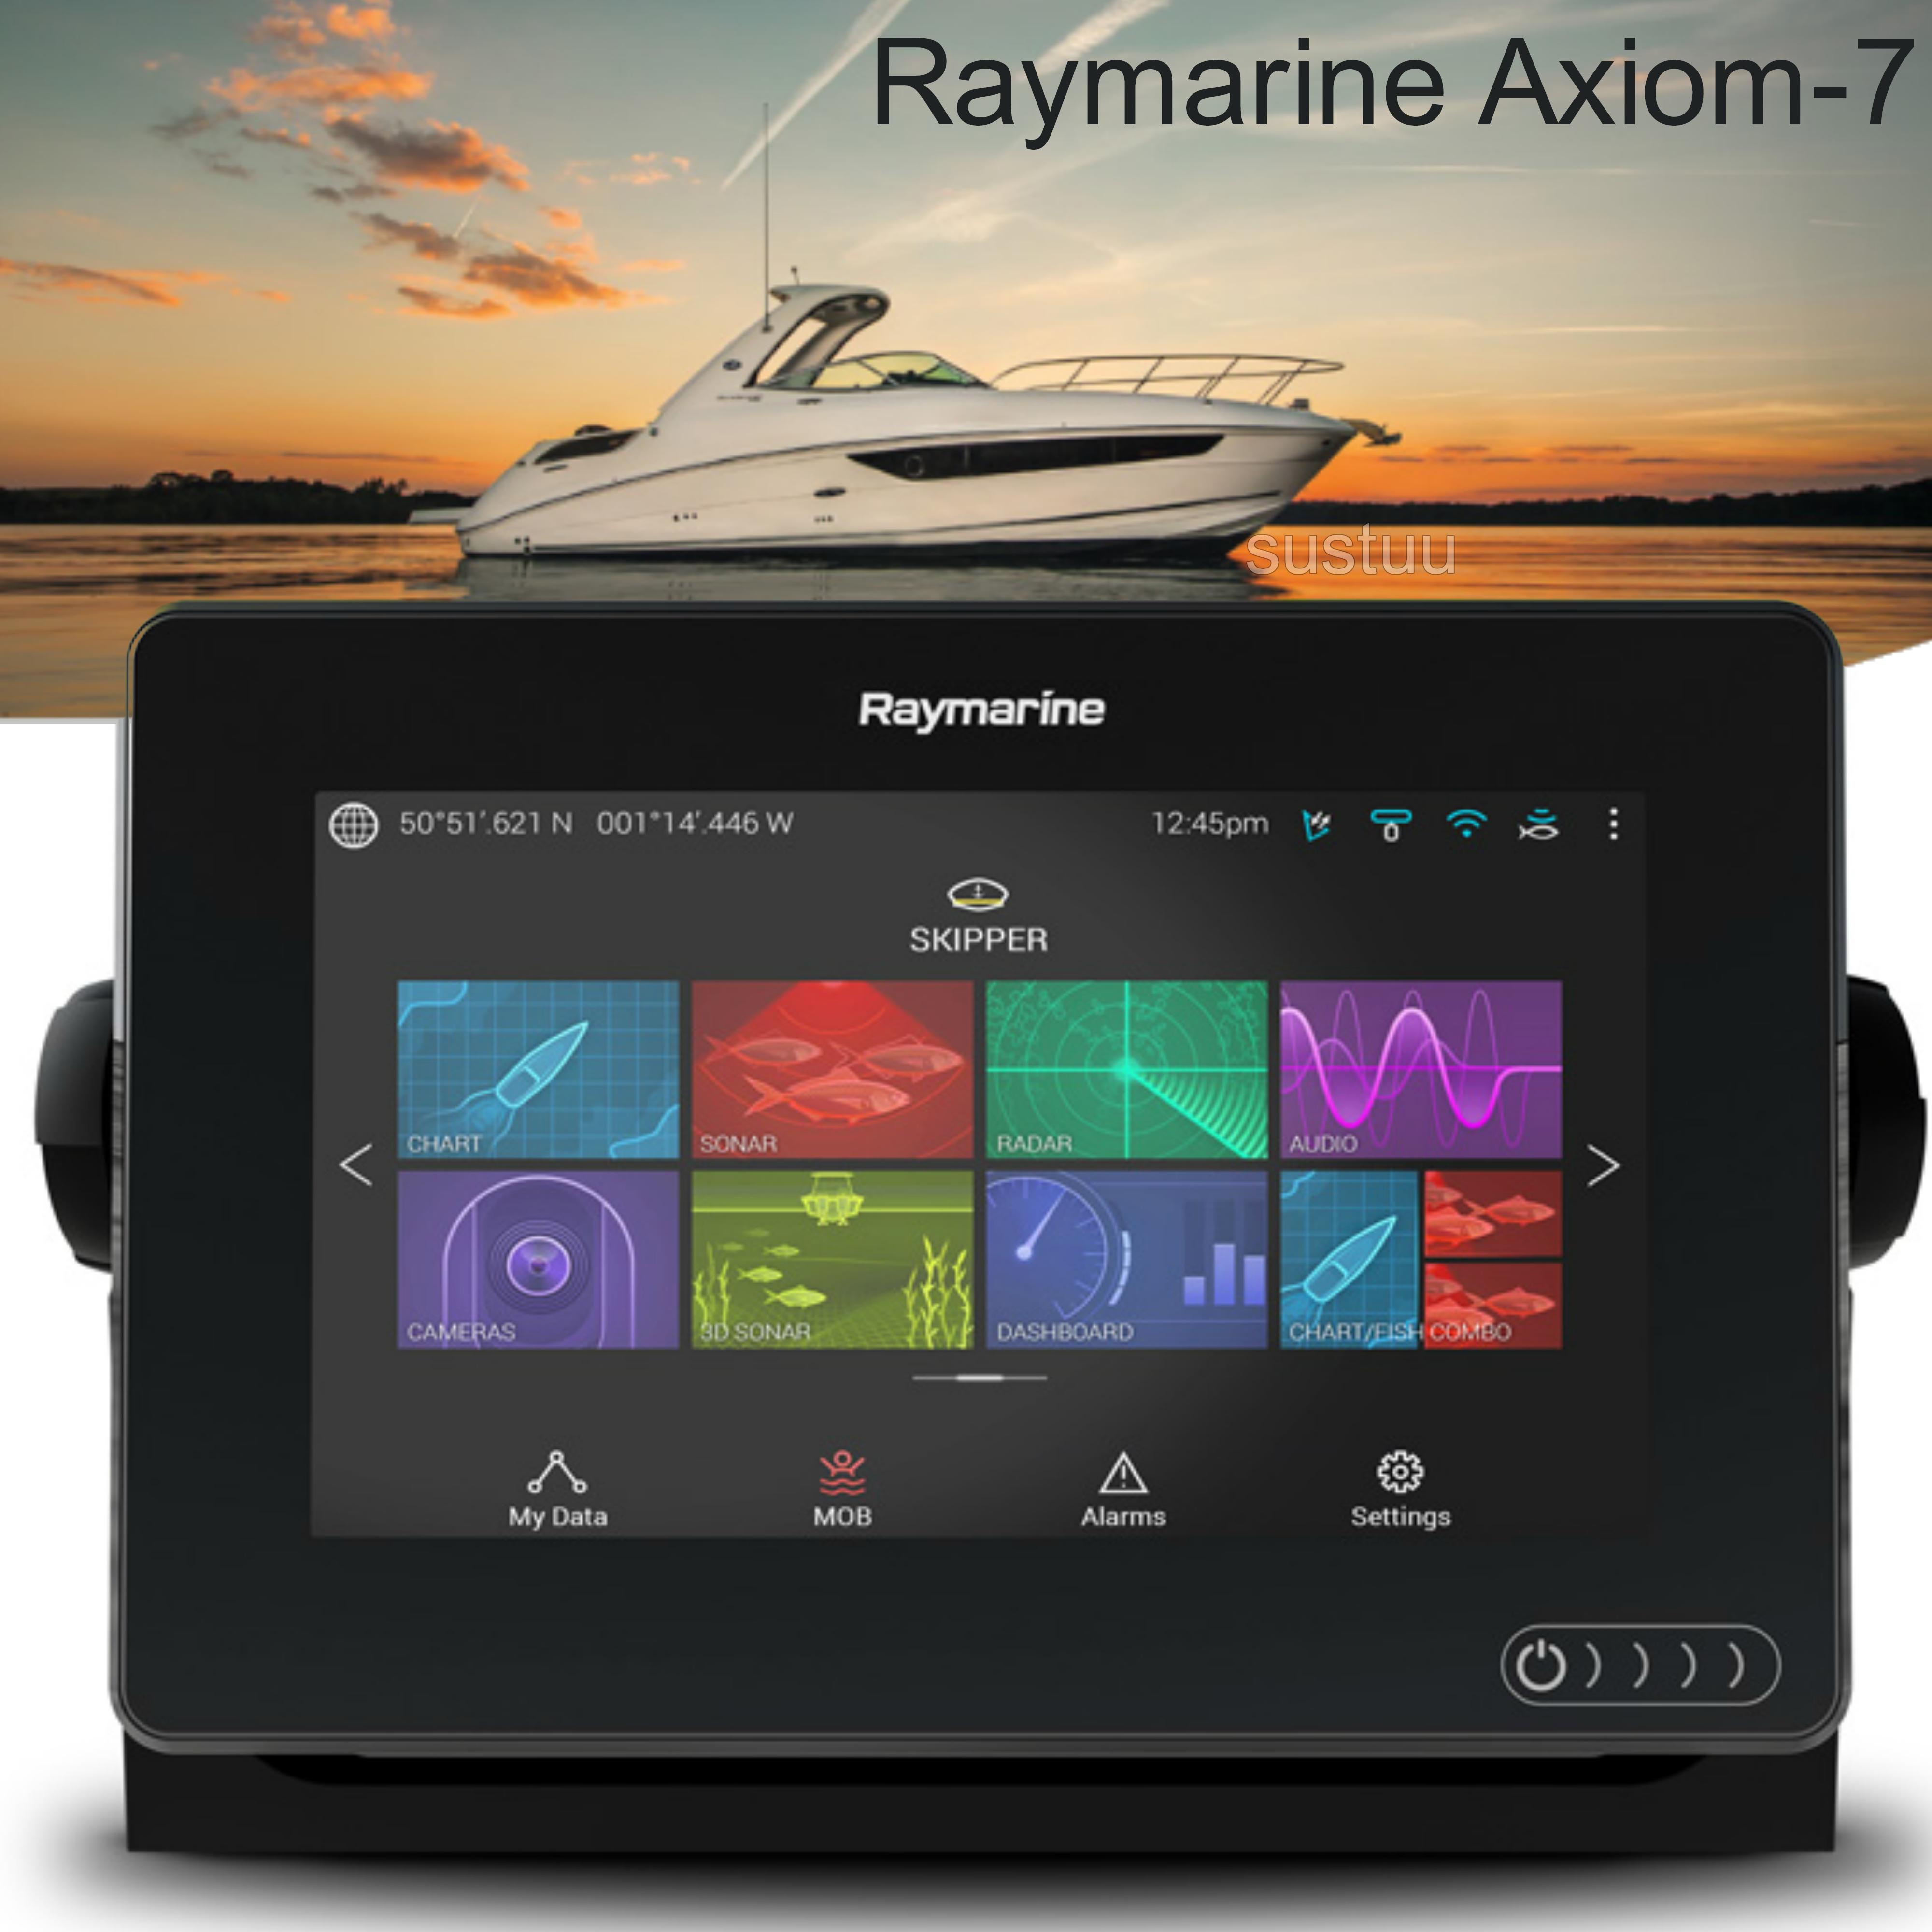 "Raymarine E70363|Axiom-7 Navigation MFD|7"" LCD|?CHIRP DV|GPS/GLONASS|IPX6/7"